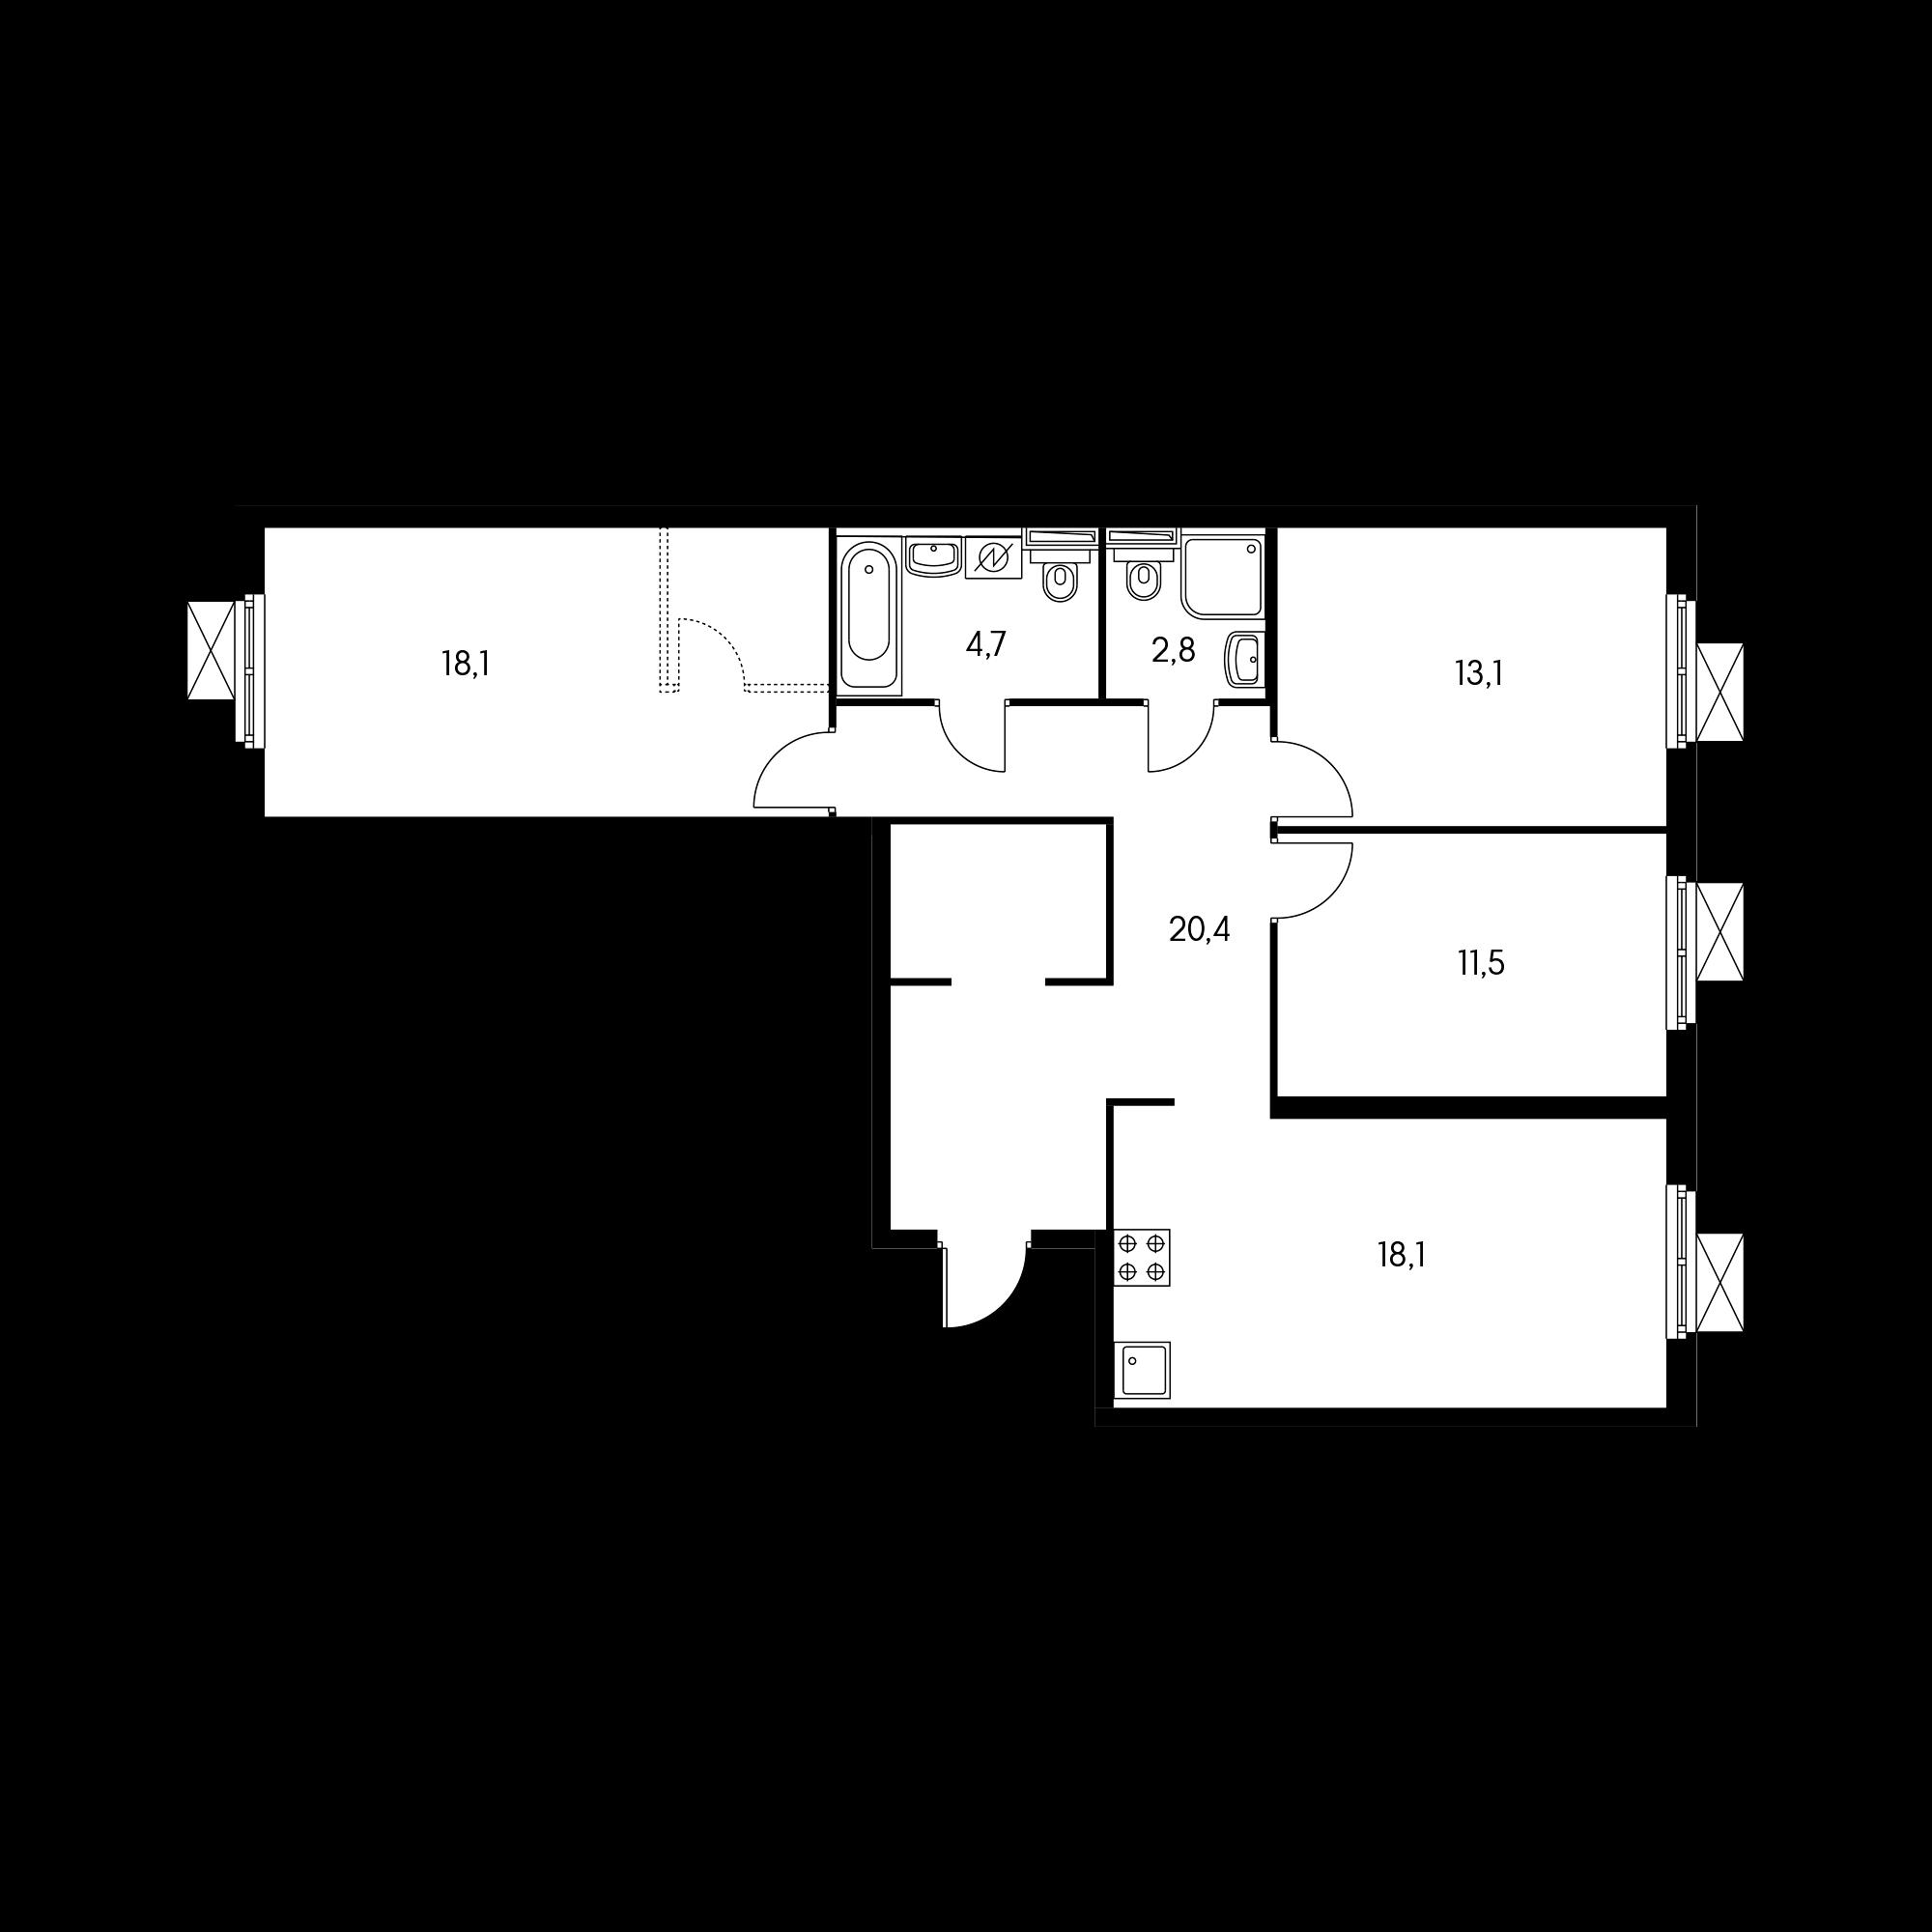 3EL4_9.6-1